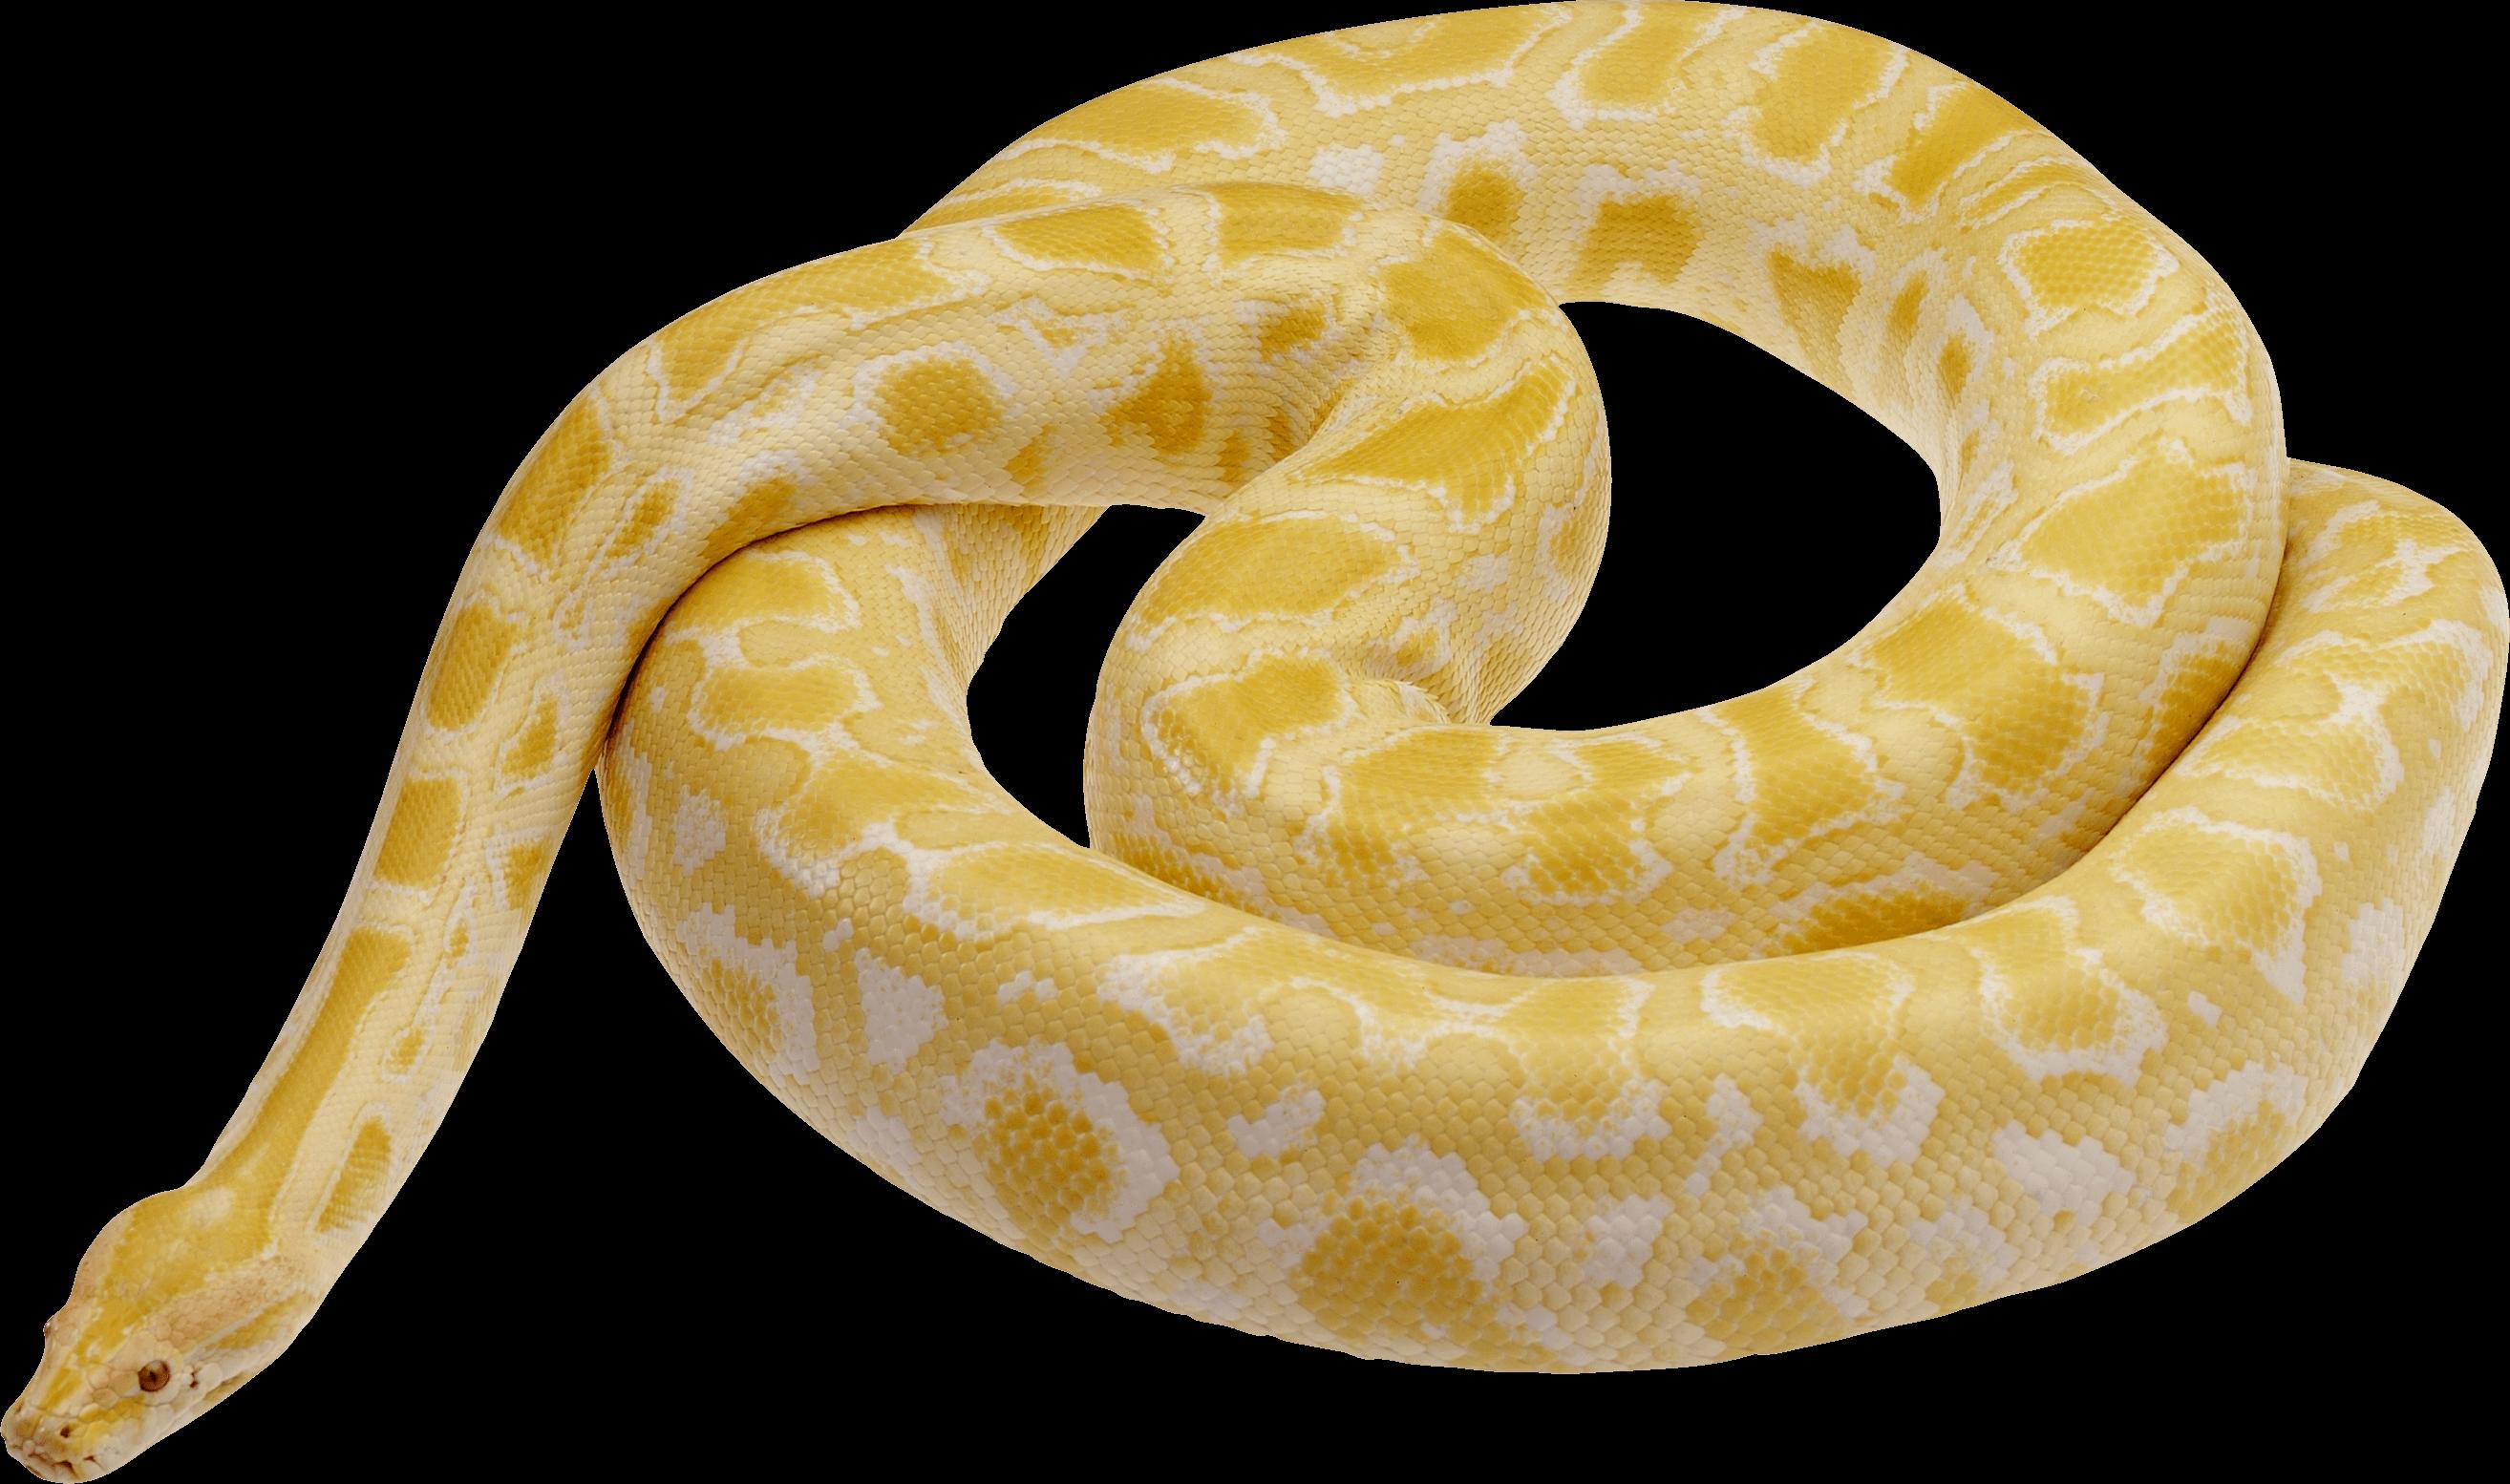 Download PNG Image - Snake Png Image Picture Download - Python Snake PNG